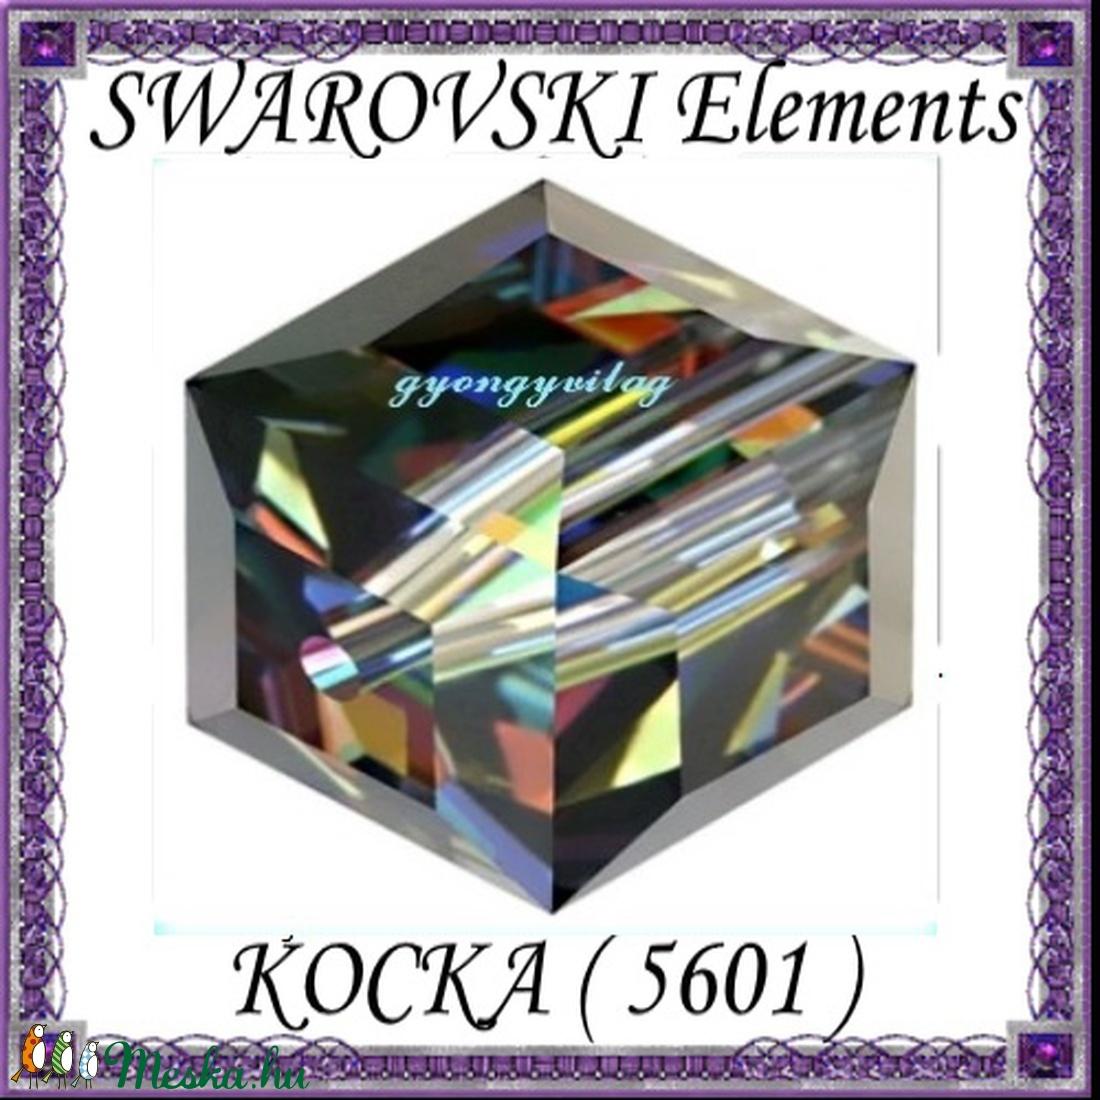 Ékszerkellék: Swarovski kocka 8mm-es AB bevonatos  több színben - gyöngy, ékszerkellék - swarovski kristályok - Meska.hu